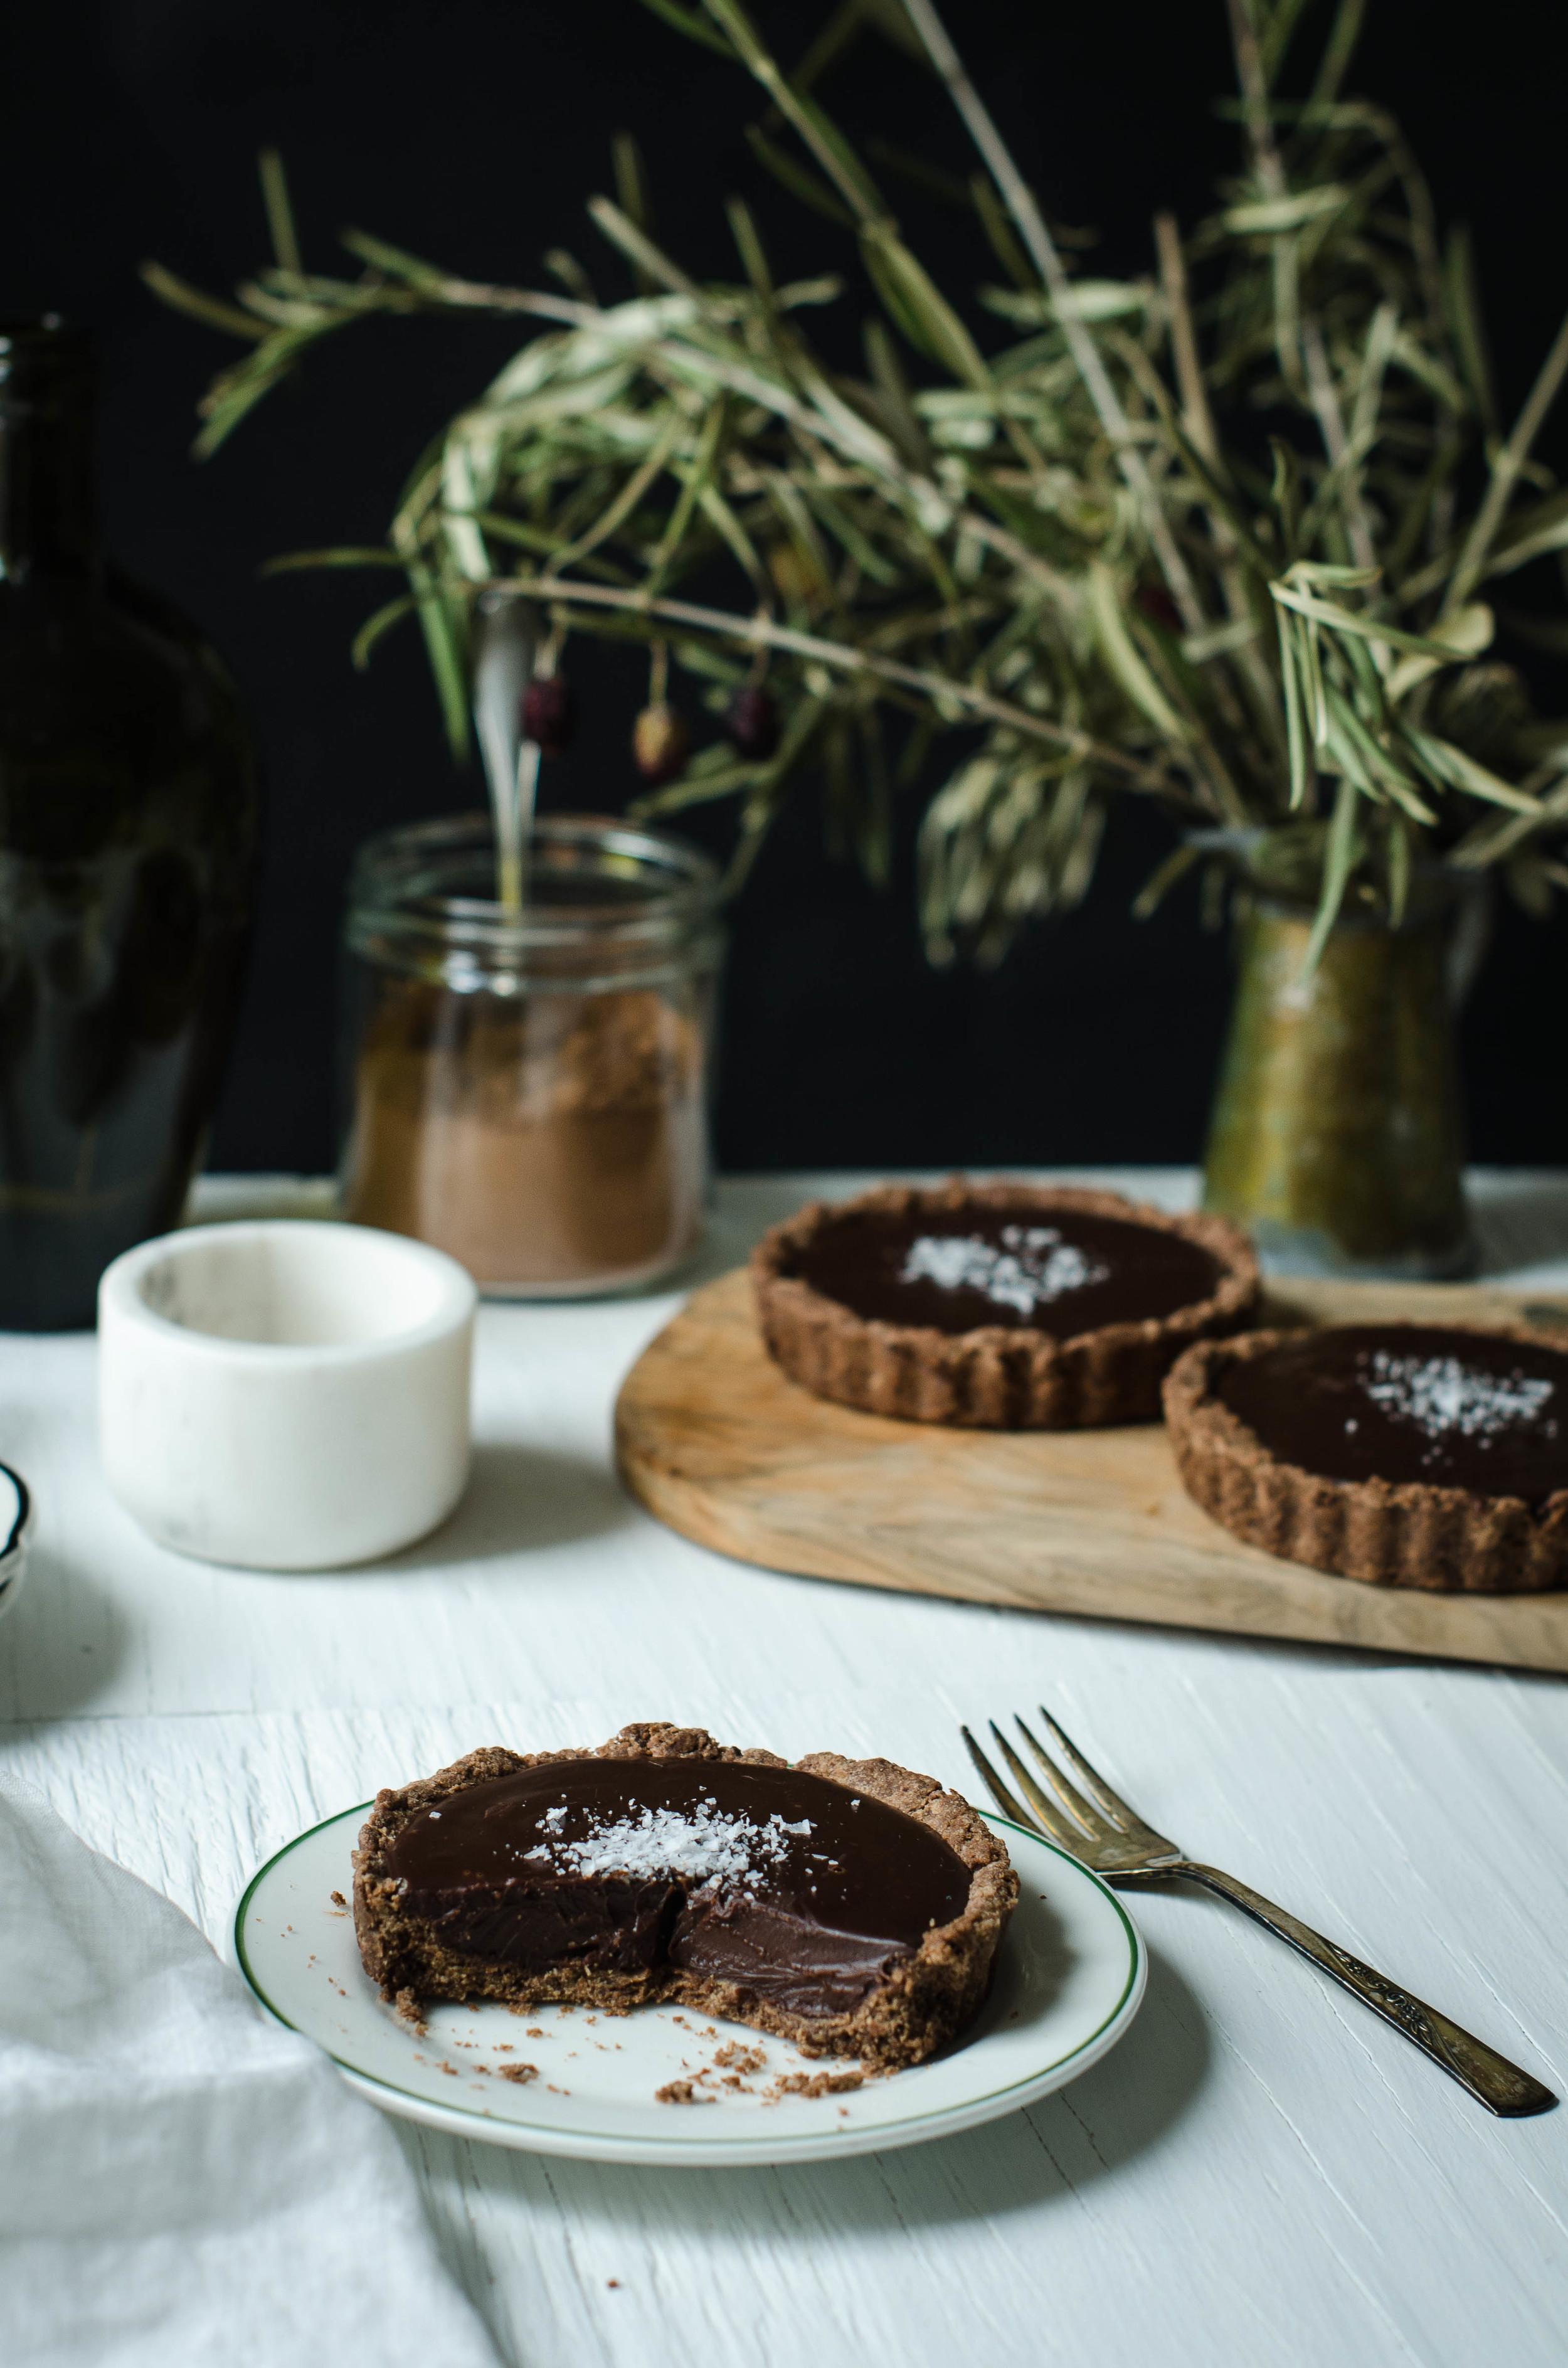 Chocolate Ganache Tart with Chocolate Olive Oil Crust